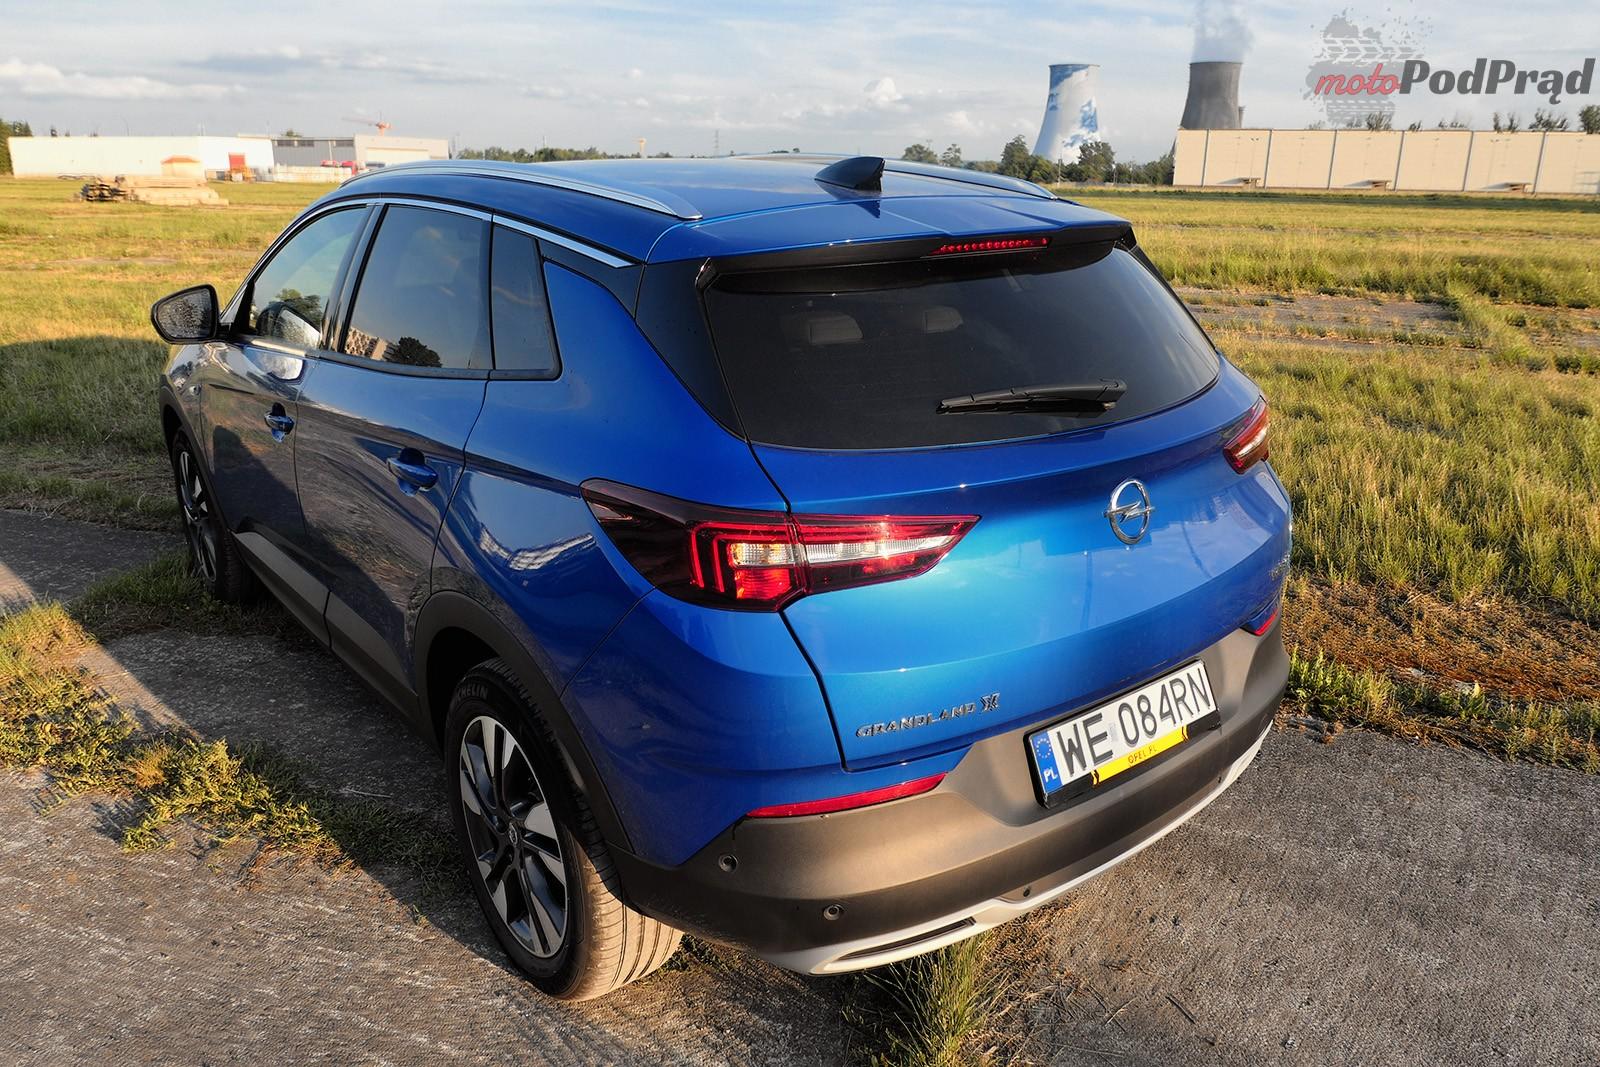 Opel Grandland X 8 Test: Opel Grandland X 1.6 CDTI 120 KM   oszczędny typ